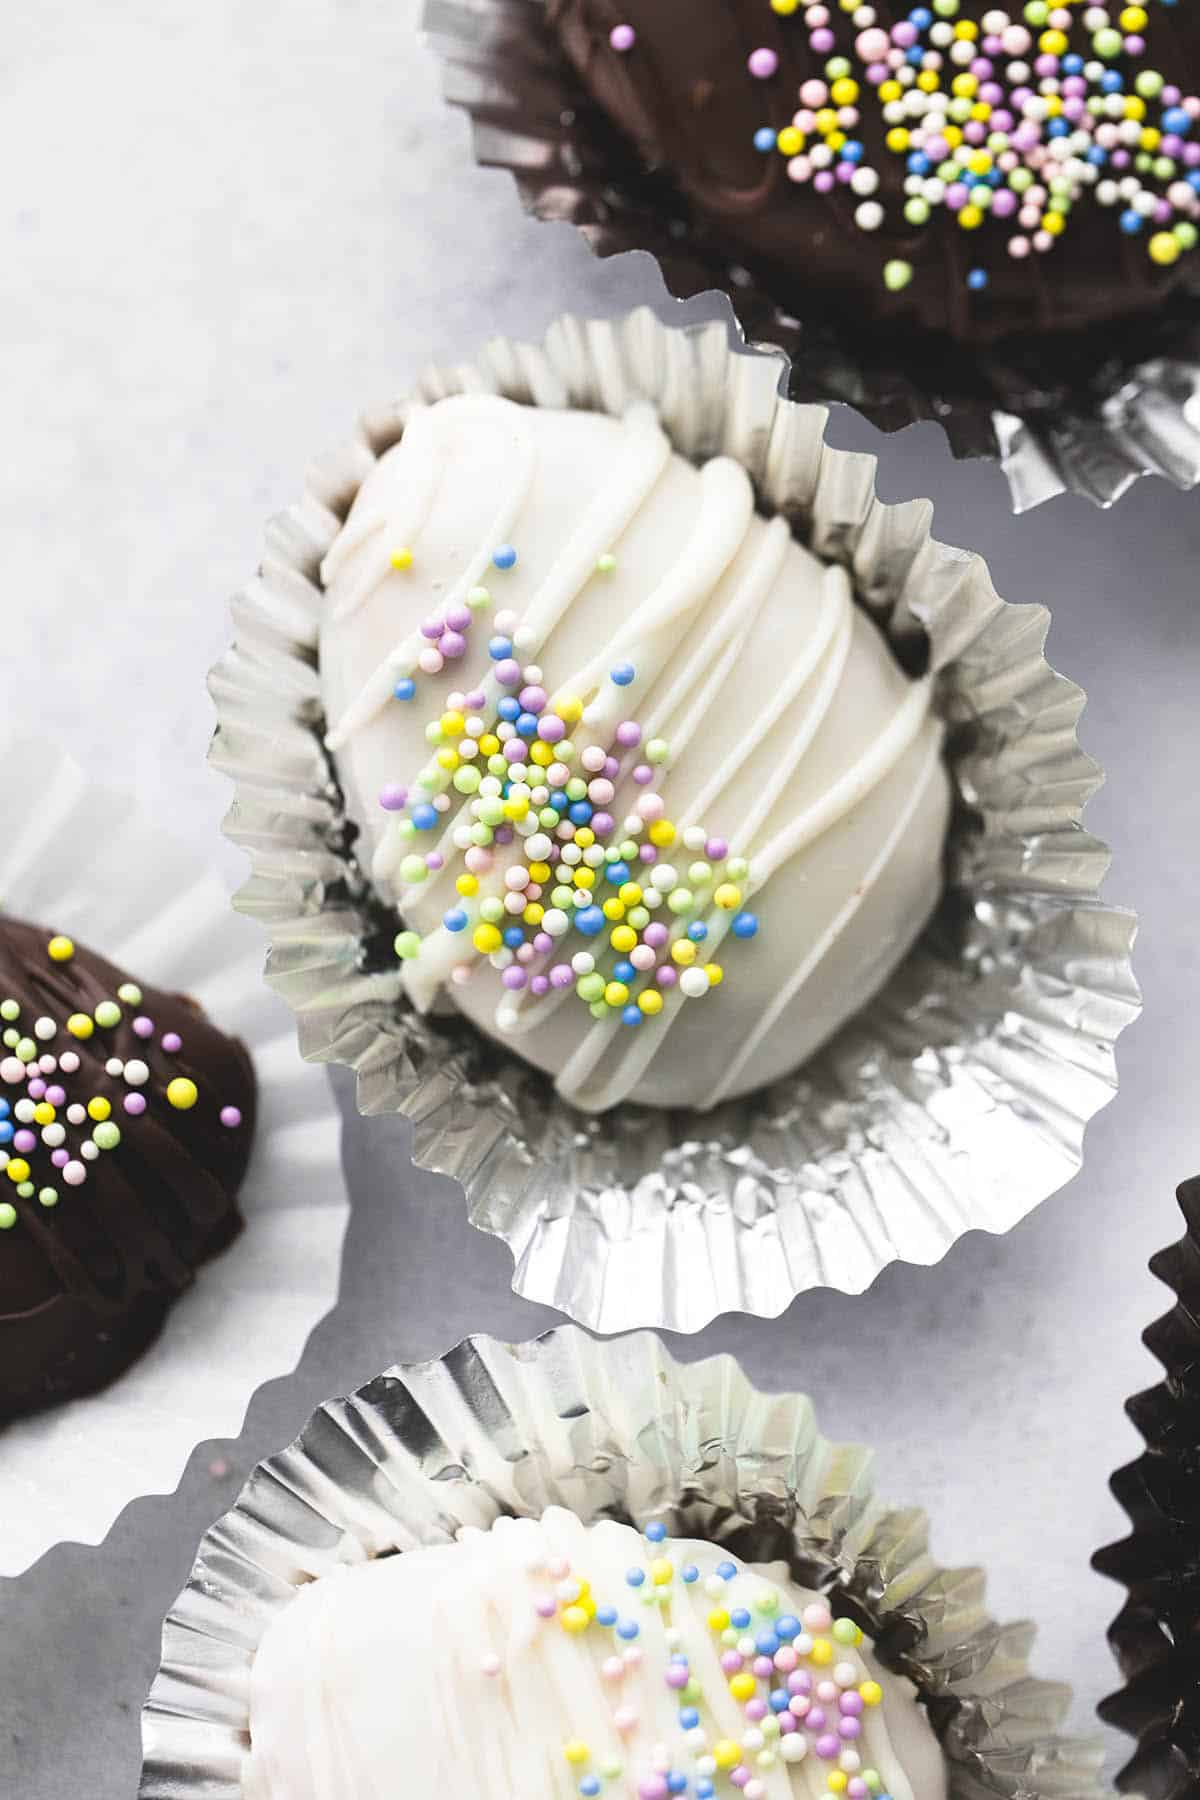 Copycat Reese's Creamy Peanut Butter Eggs | lecremedelacrumb.com